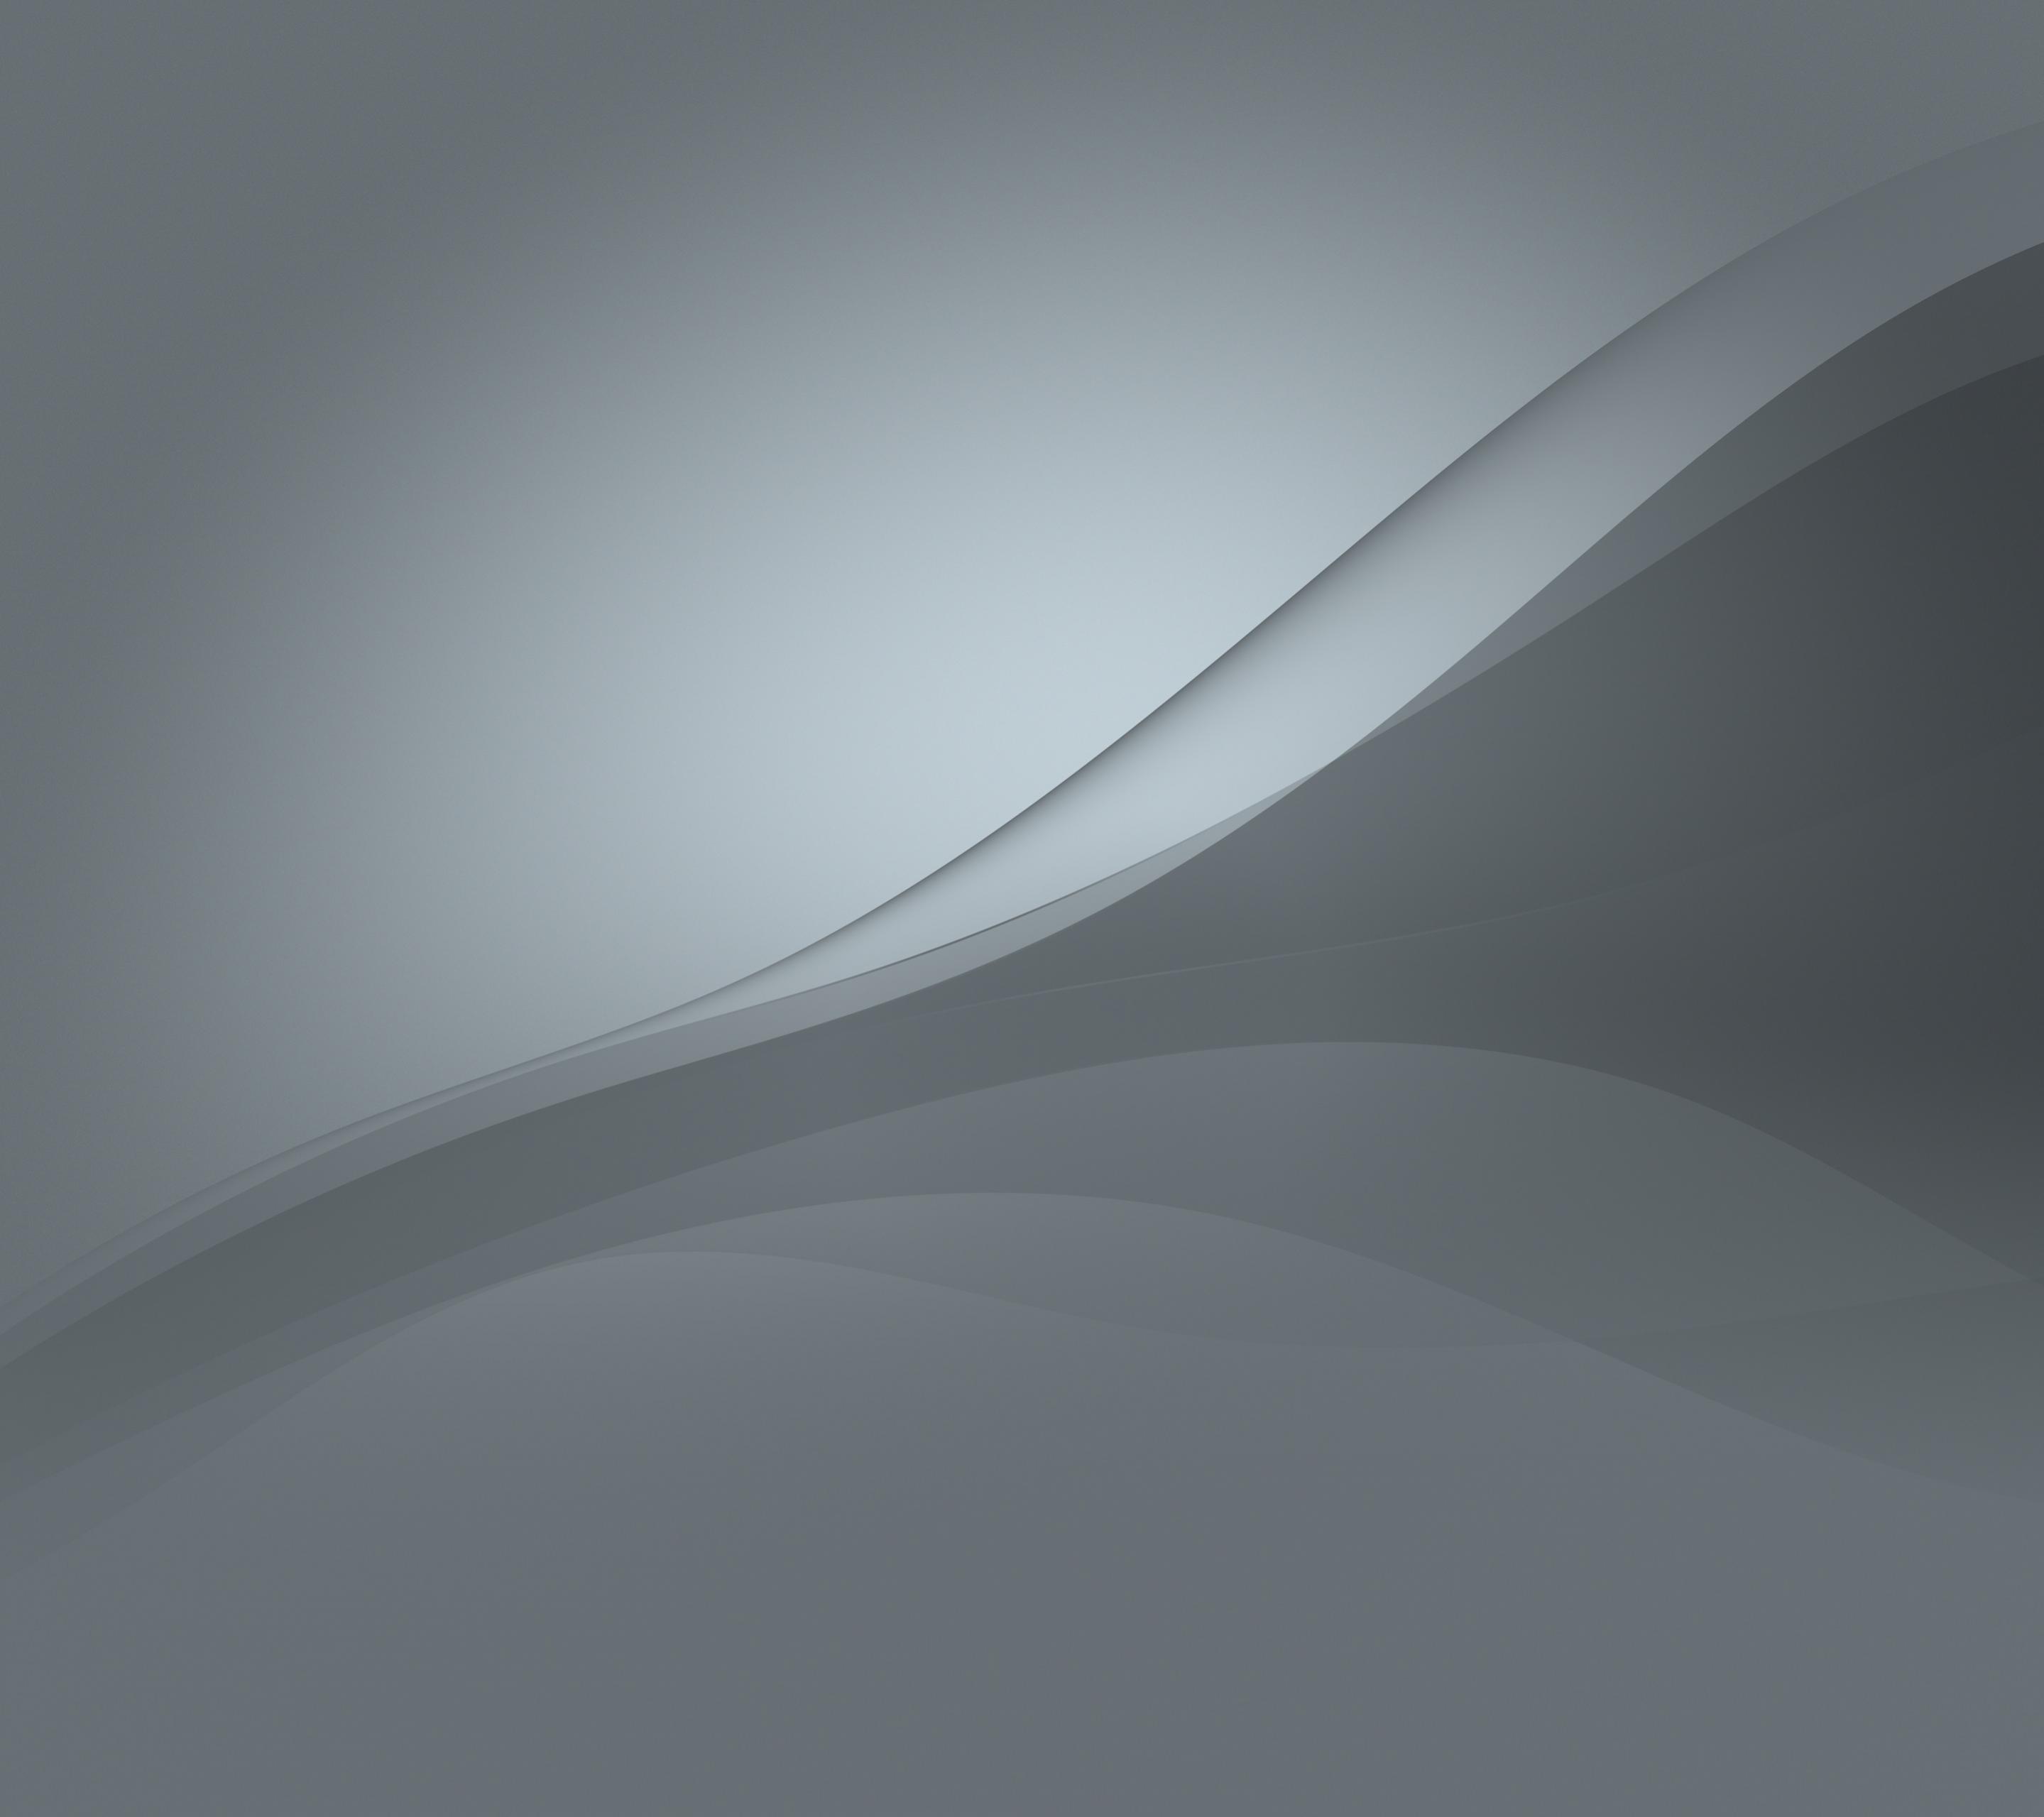 Sony Xperia Z5 Wallpaper